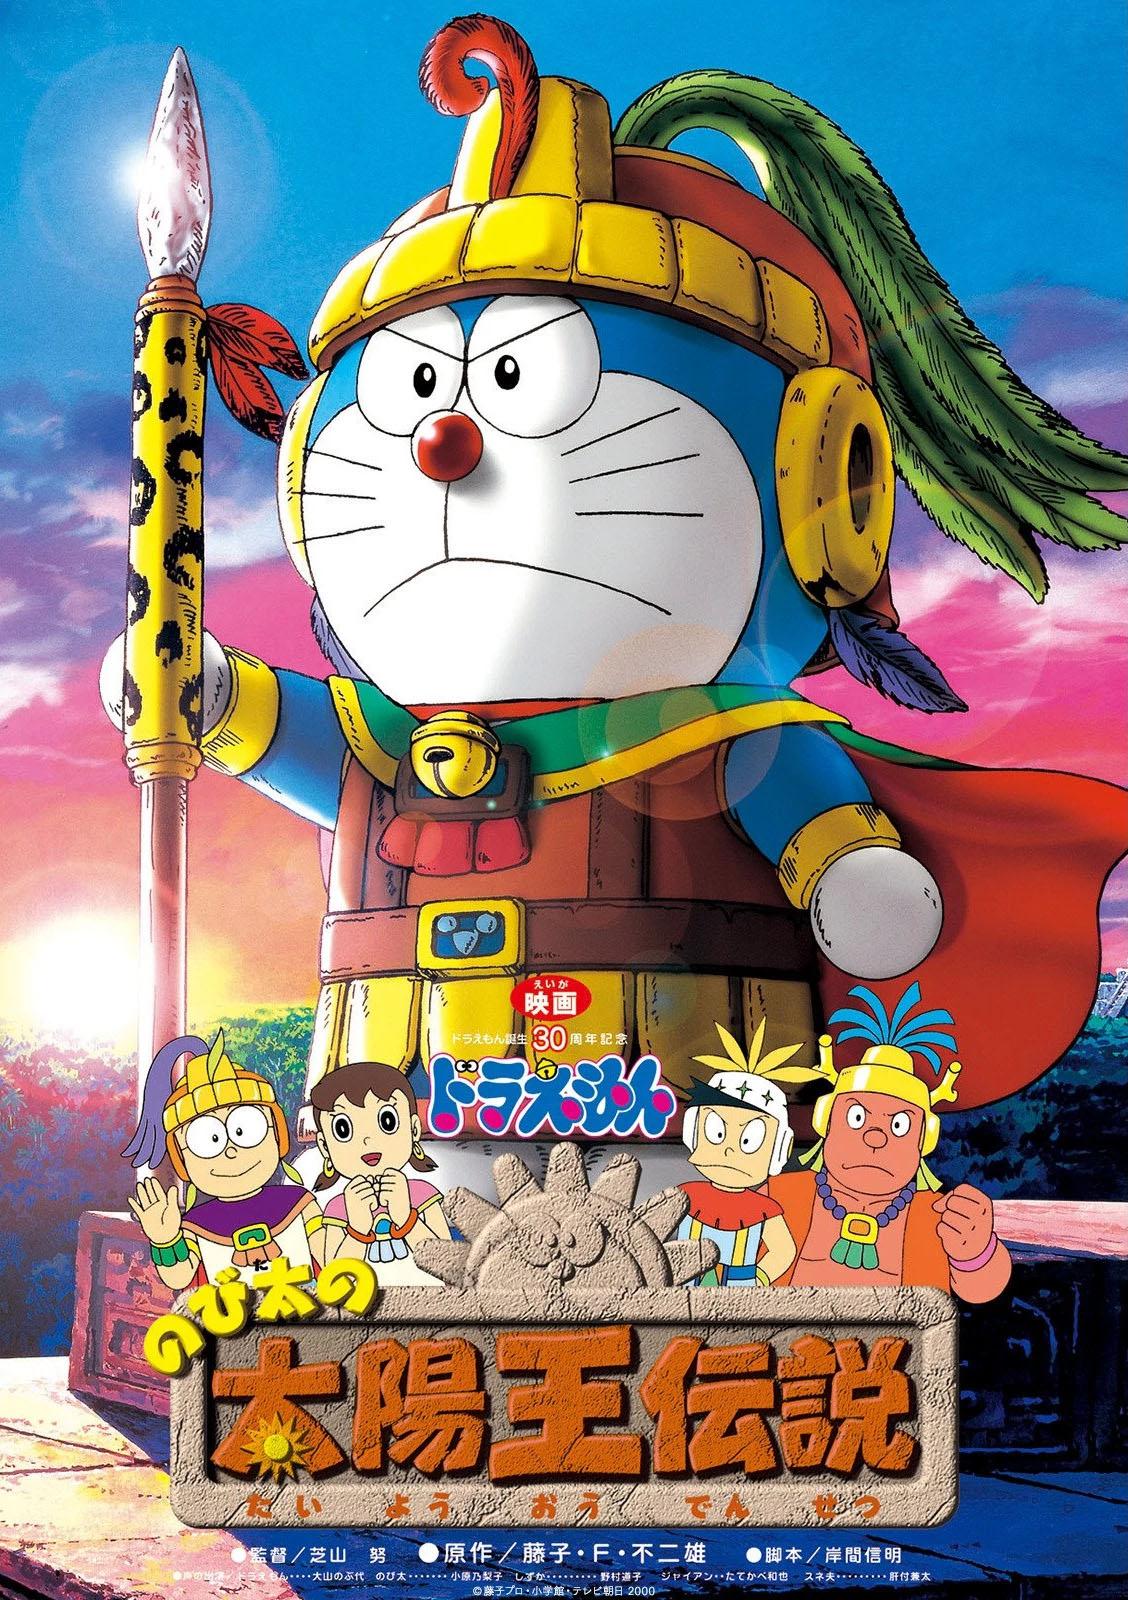 Doraemon The Movie 2000 โดเรม่อน เดอะมูฟวี่ ตอน ตำนานสุริยกษัตริย์ พากย์ไทย